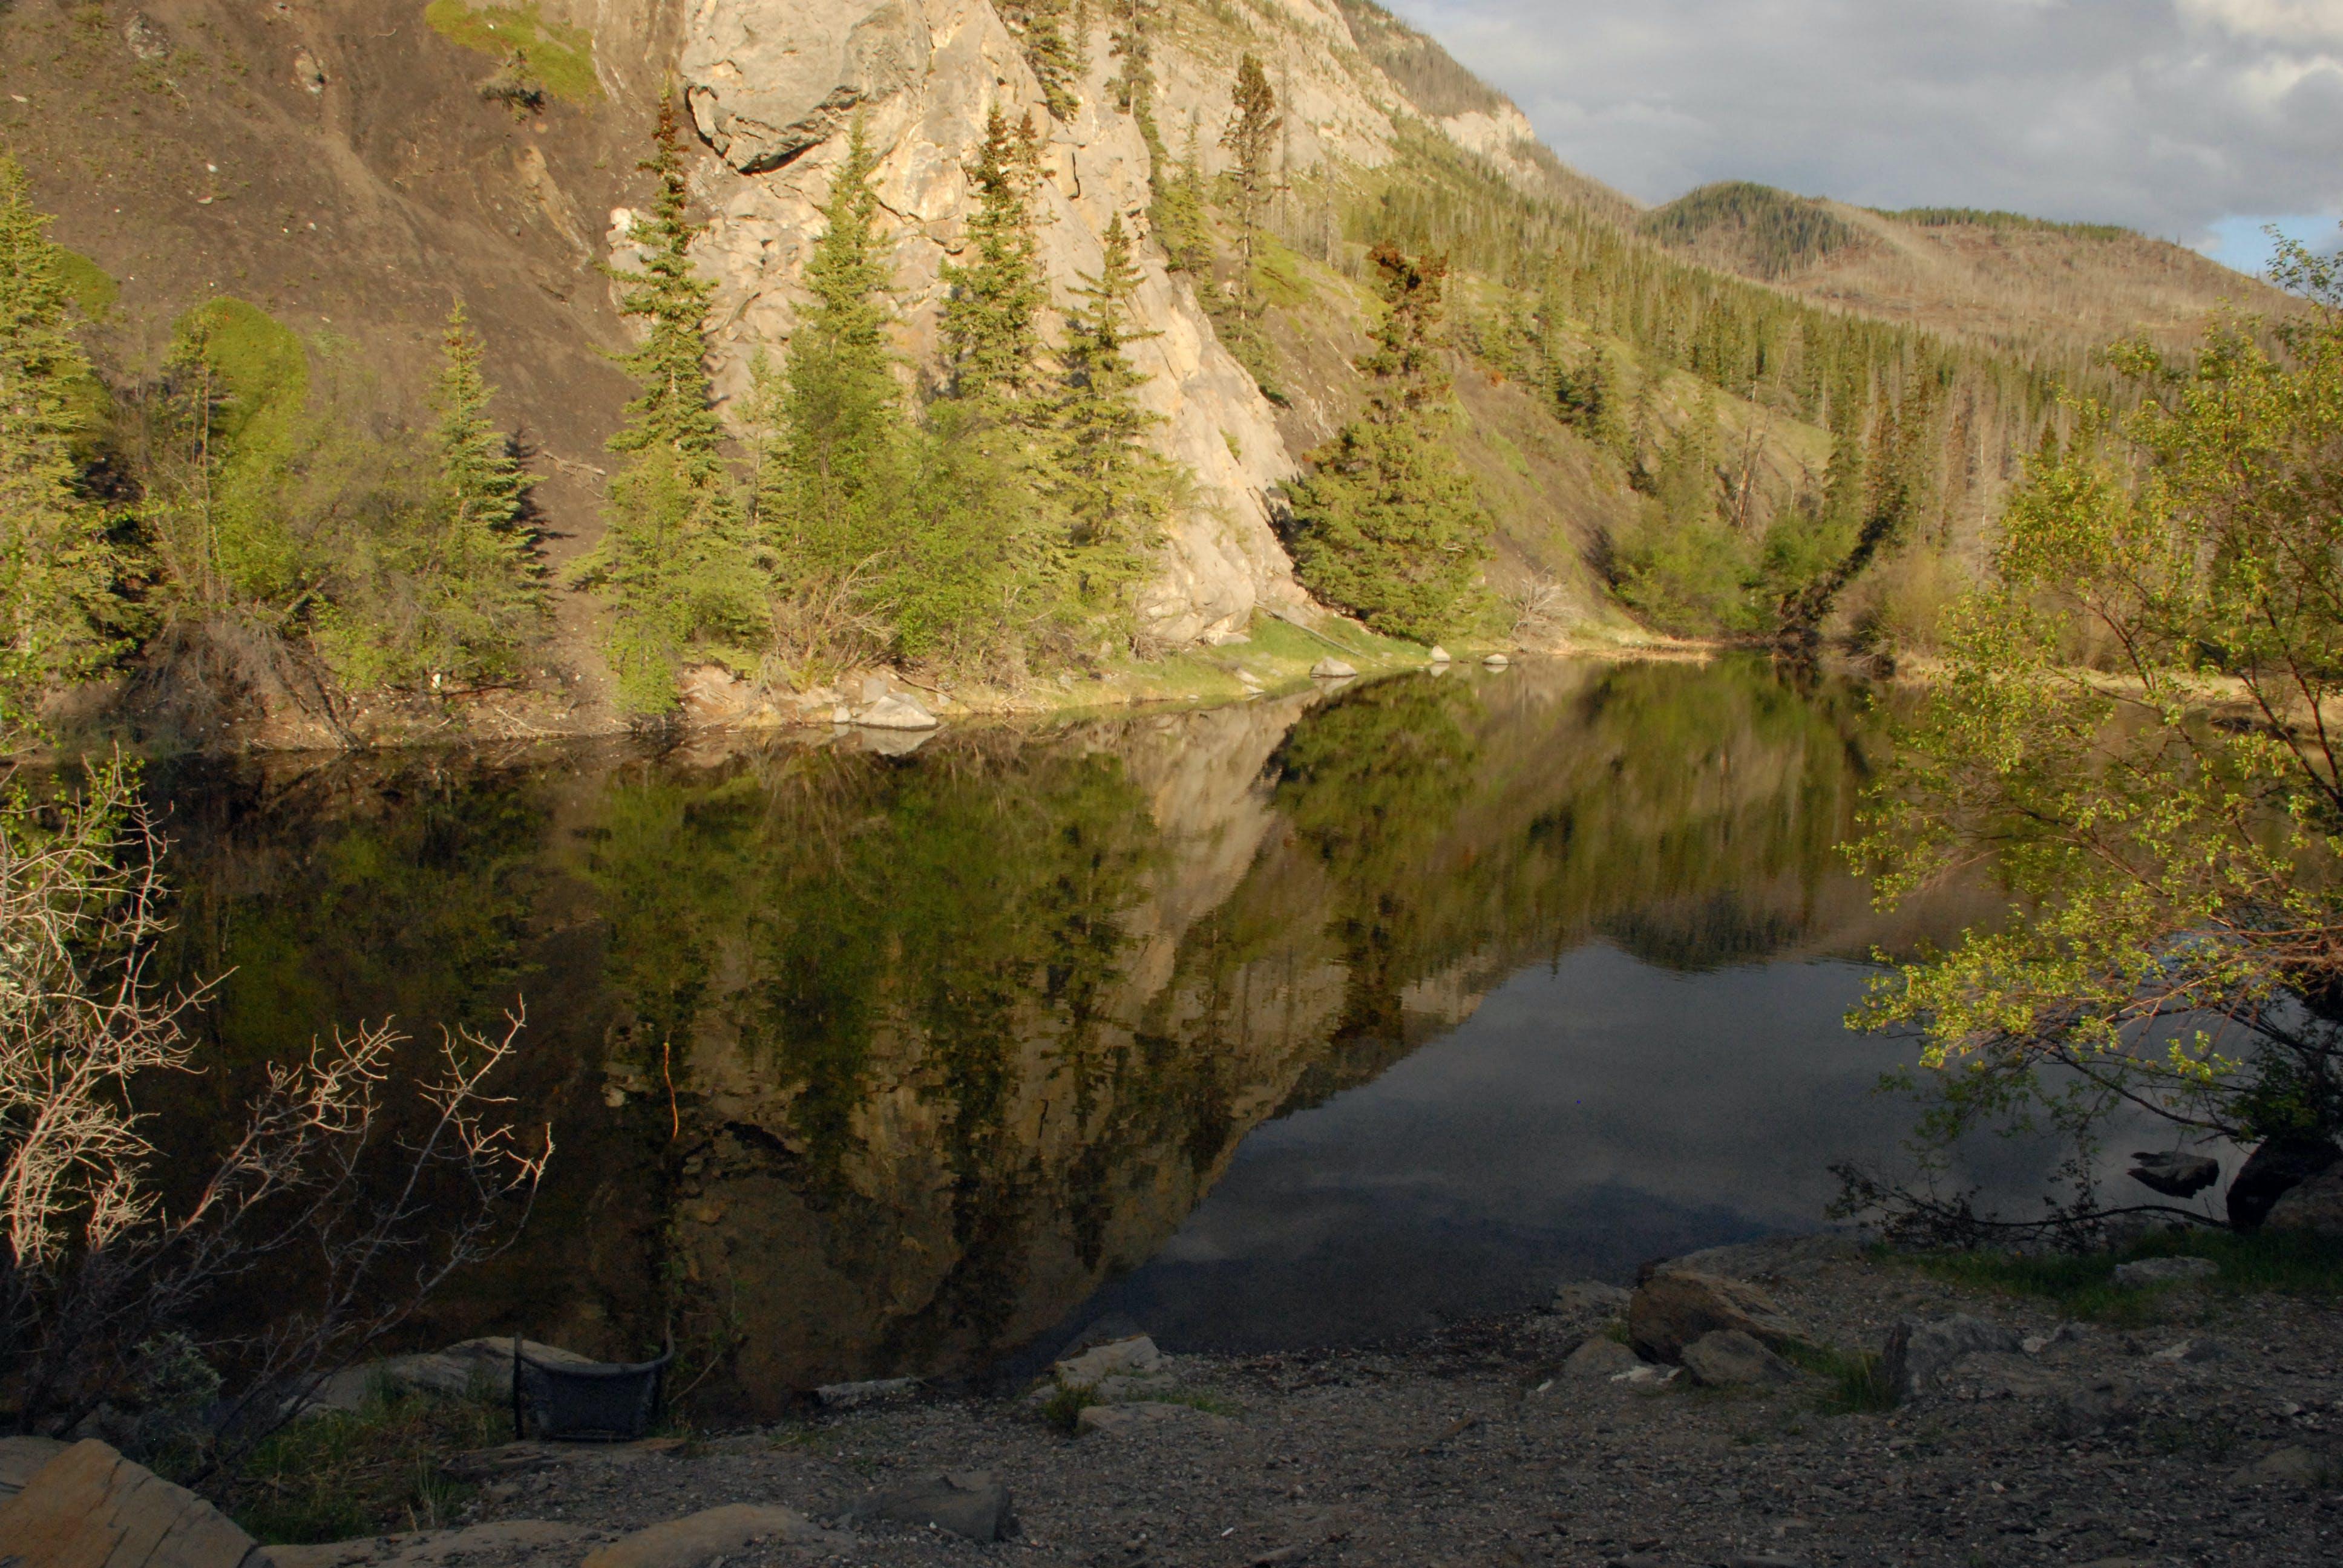 Free stock photo of jasper national park, mountain reflection, water